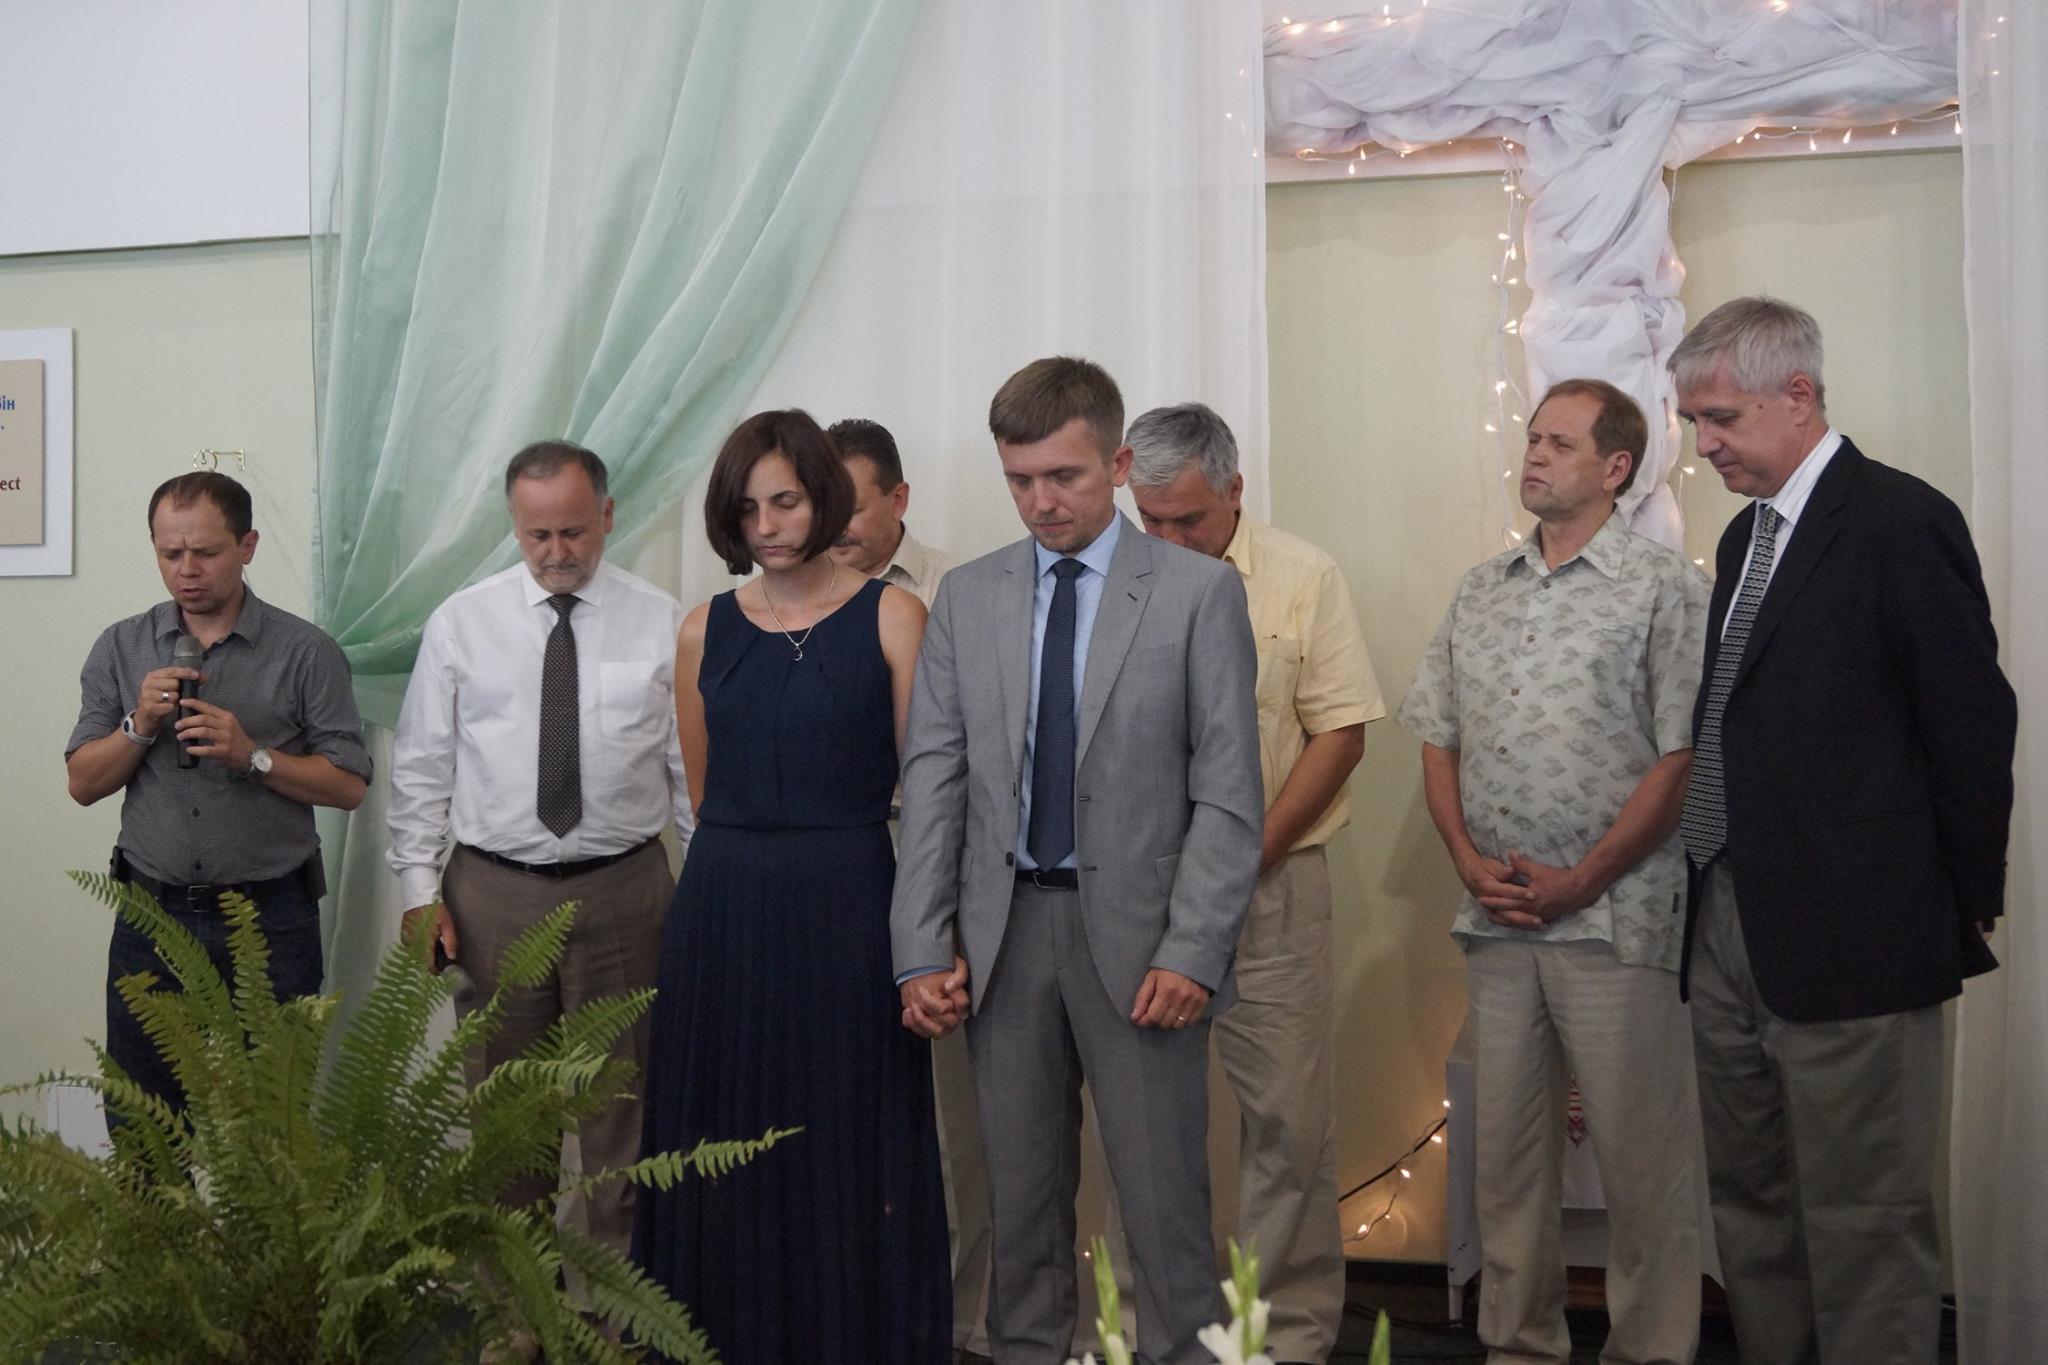 2015-08-15 Sasha being prayed for.jpg